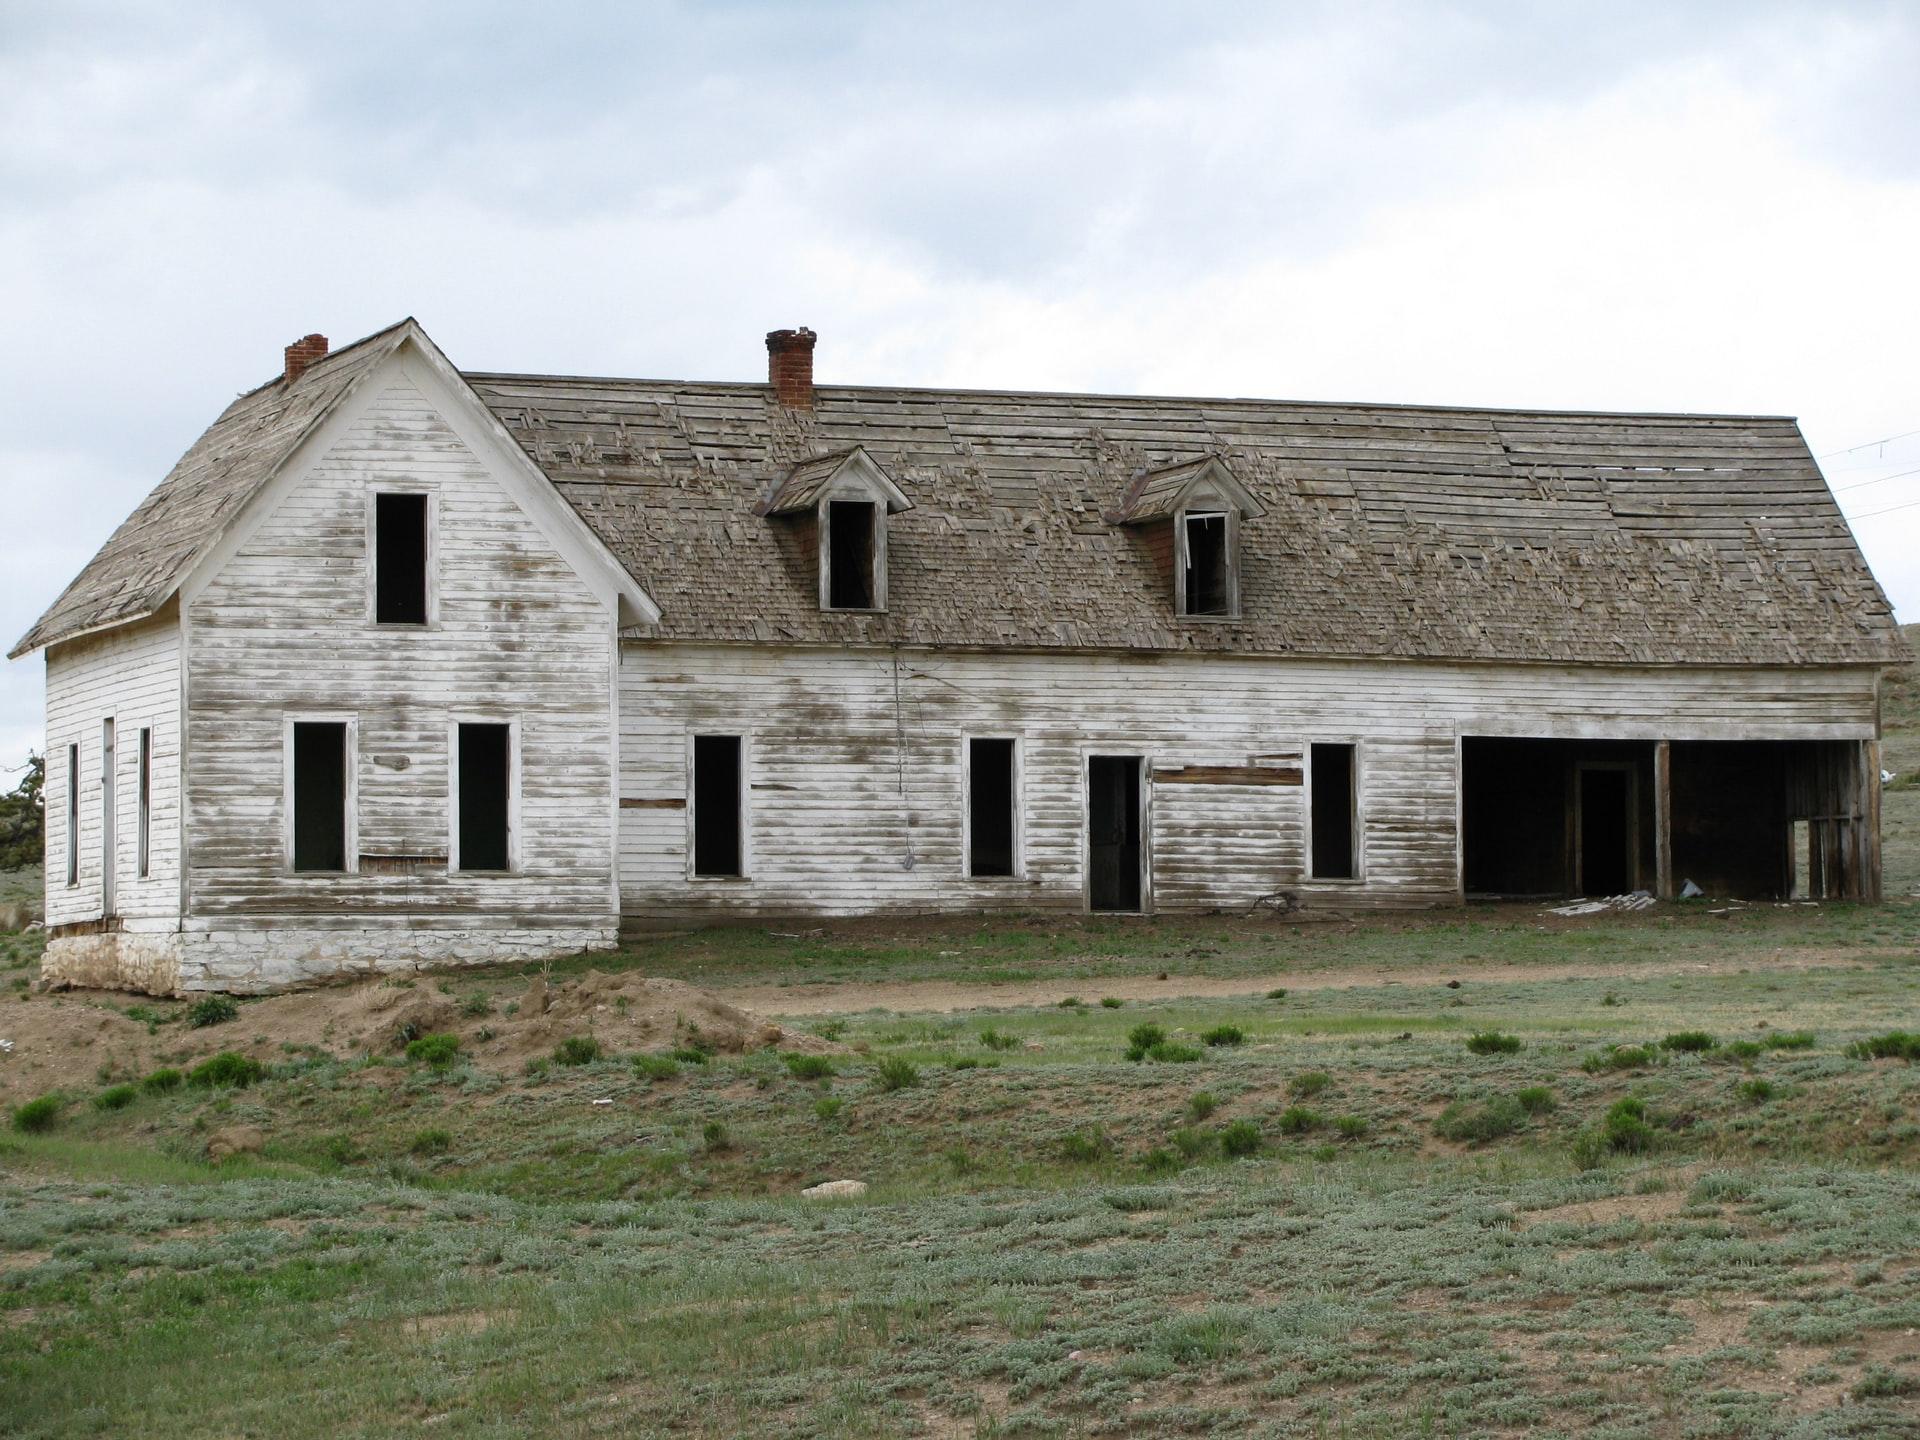 Foto Rumah Lama